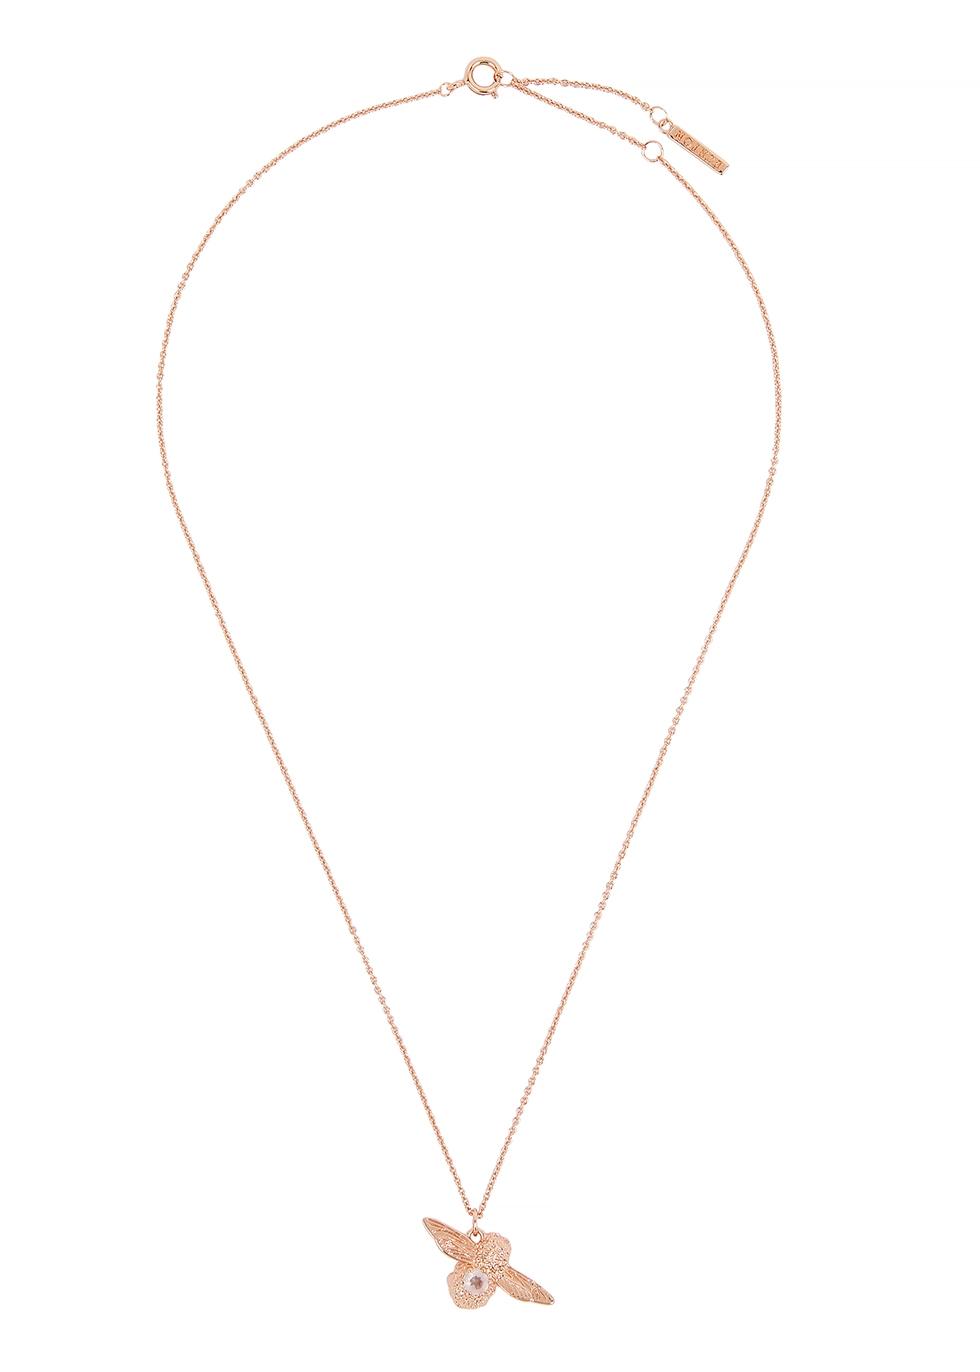 OLIVIA BURTON | Olivia Burton Bejewelled Bee Rose Gold-Plated Necklace | Goxip